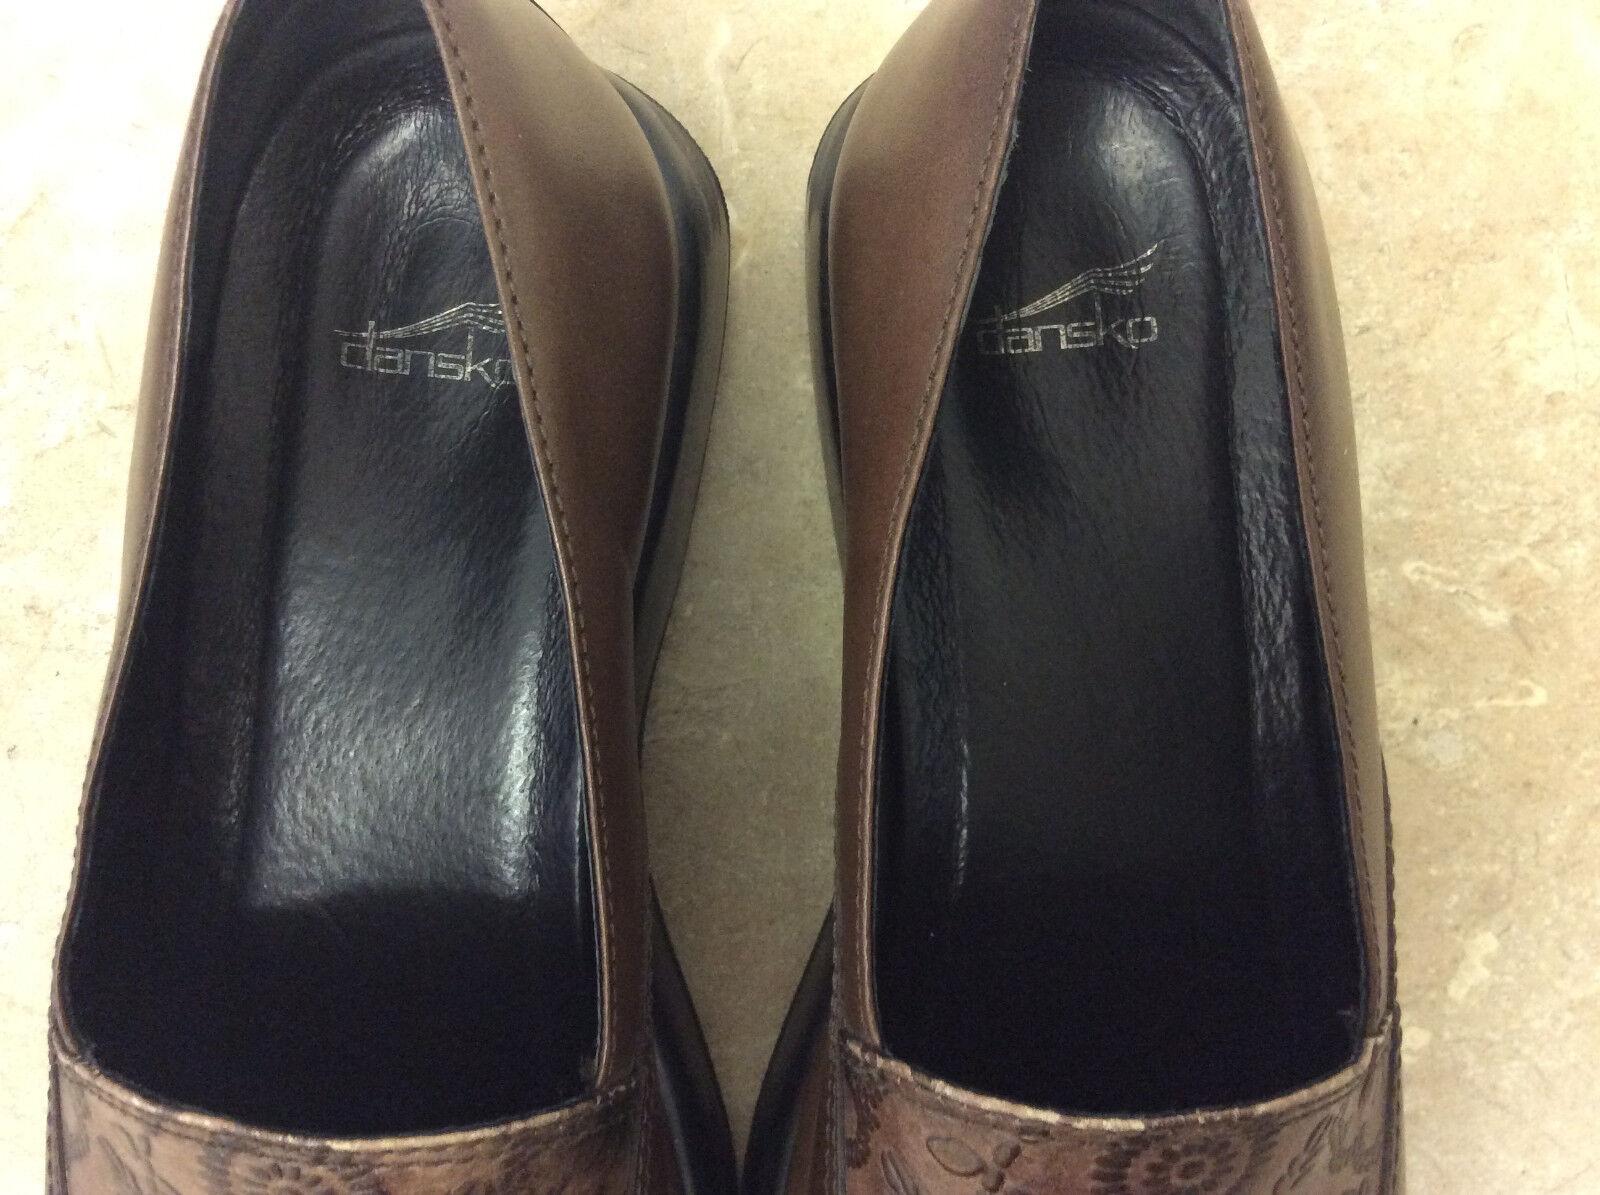 Dansko Mandolin braun Clog Leather damen damen damen Größe 41 US 10.5 7304780200 schuhe 78a73c